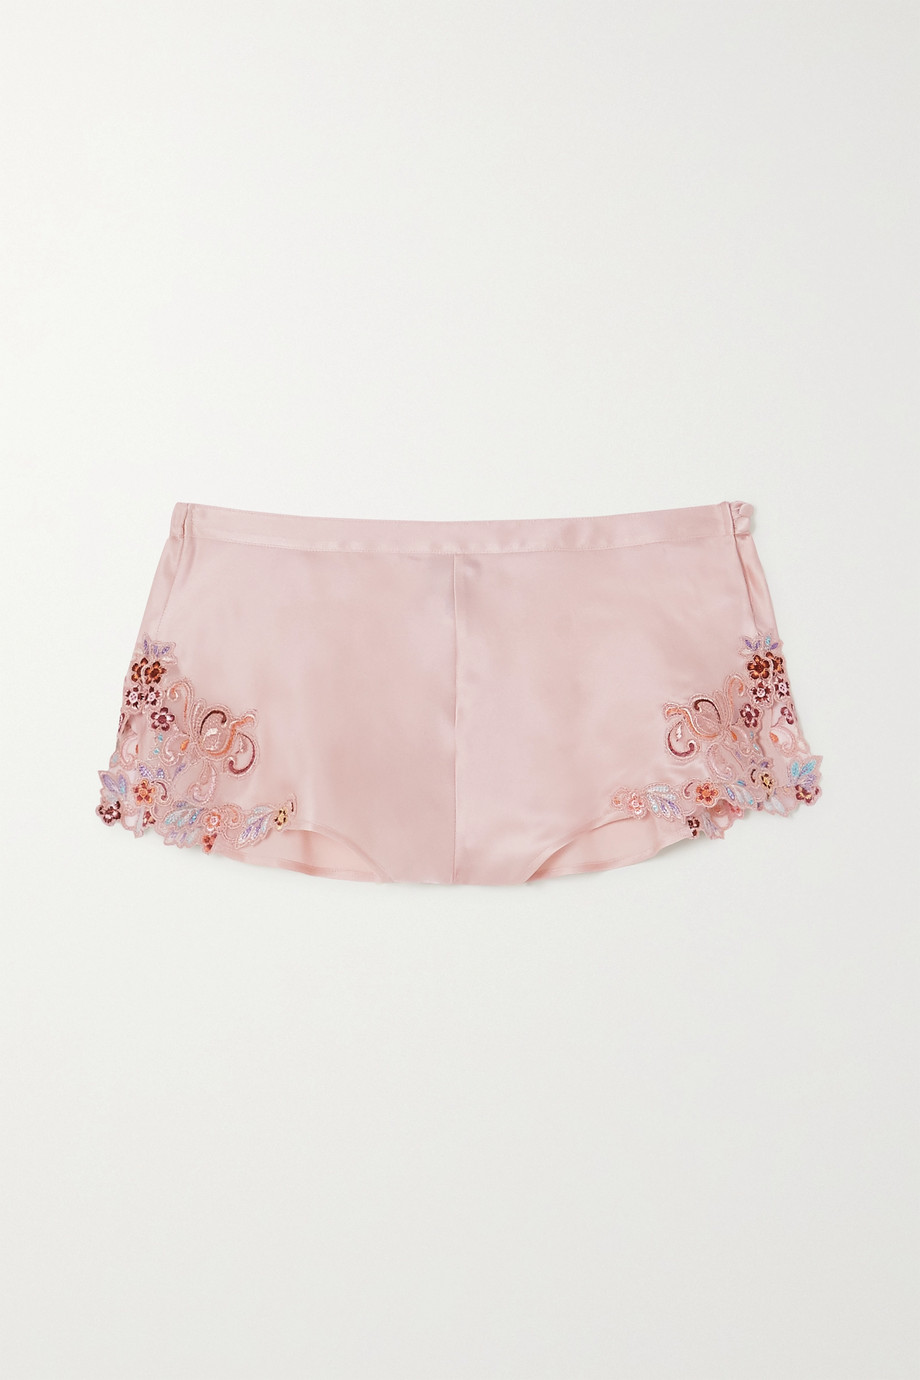 La Perla Maison Rainbow embroidered lace-trimmed silk-satin pajama shorts